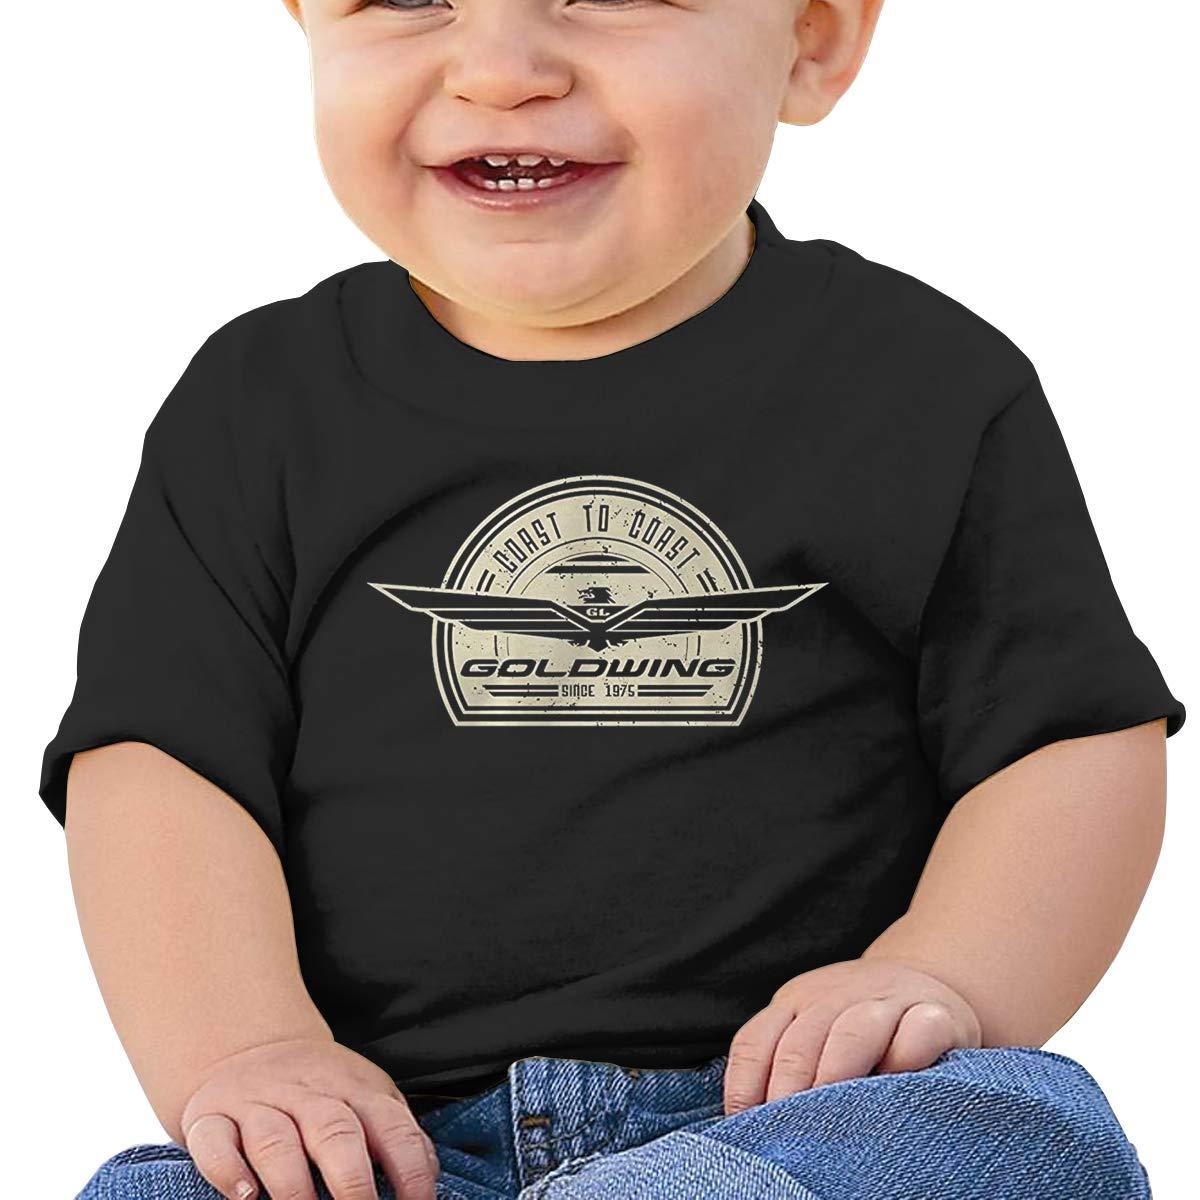 MONIKAL Unisex Infant Short Sleeve T-Shirt Goldwing-Retro Toddler Kids Organic Cotton Graphic Tee Tops